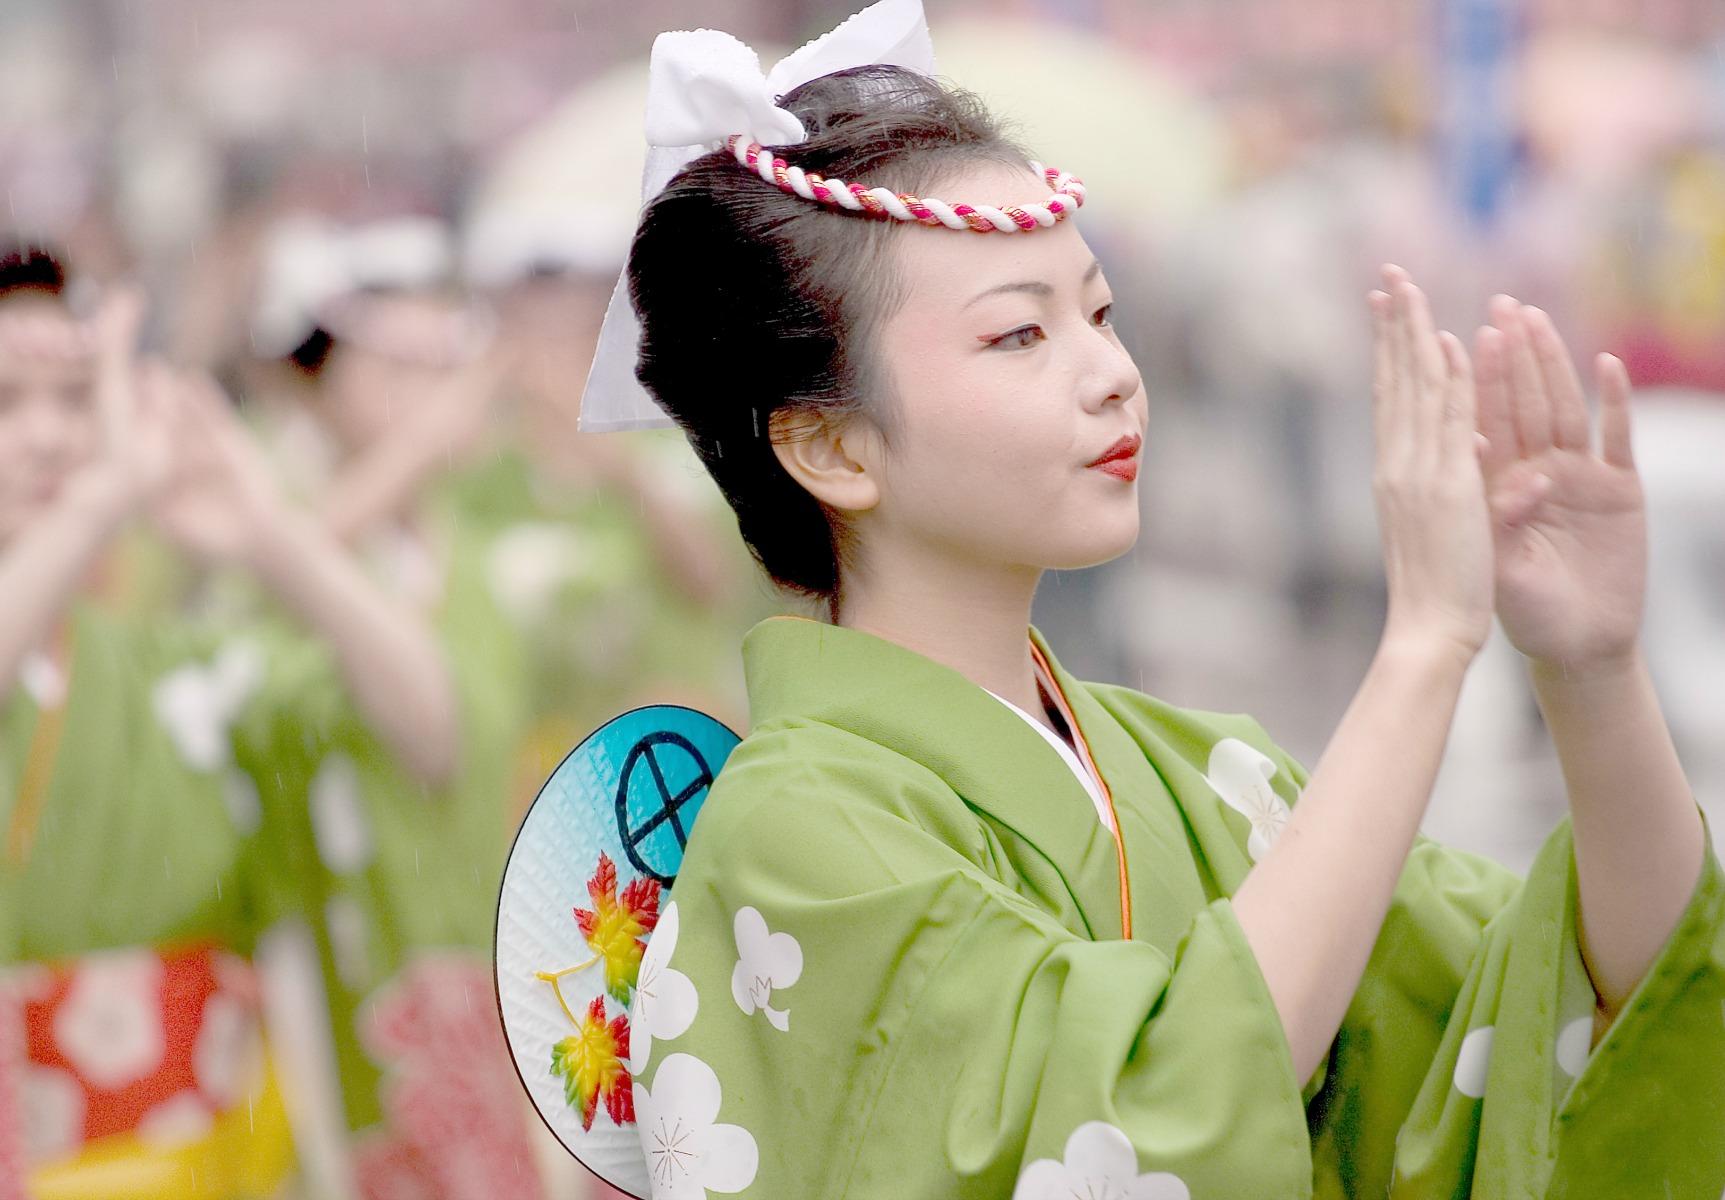 japansk dans, danser, japan, japaner, dans